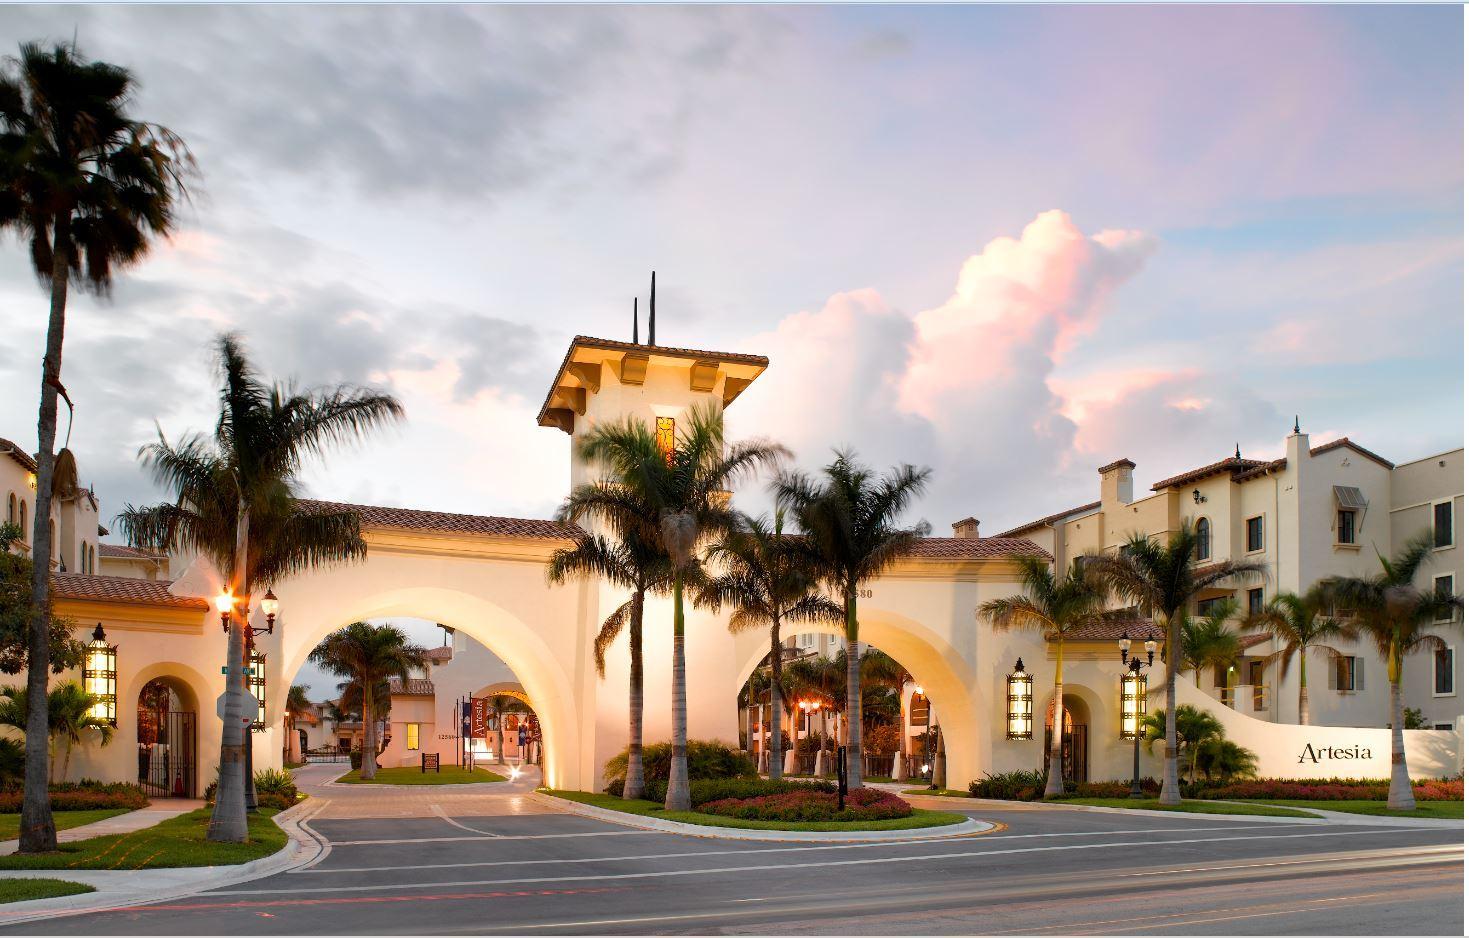 Photo of Artesia in Sunrise, FL 33323